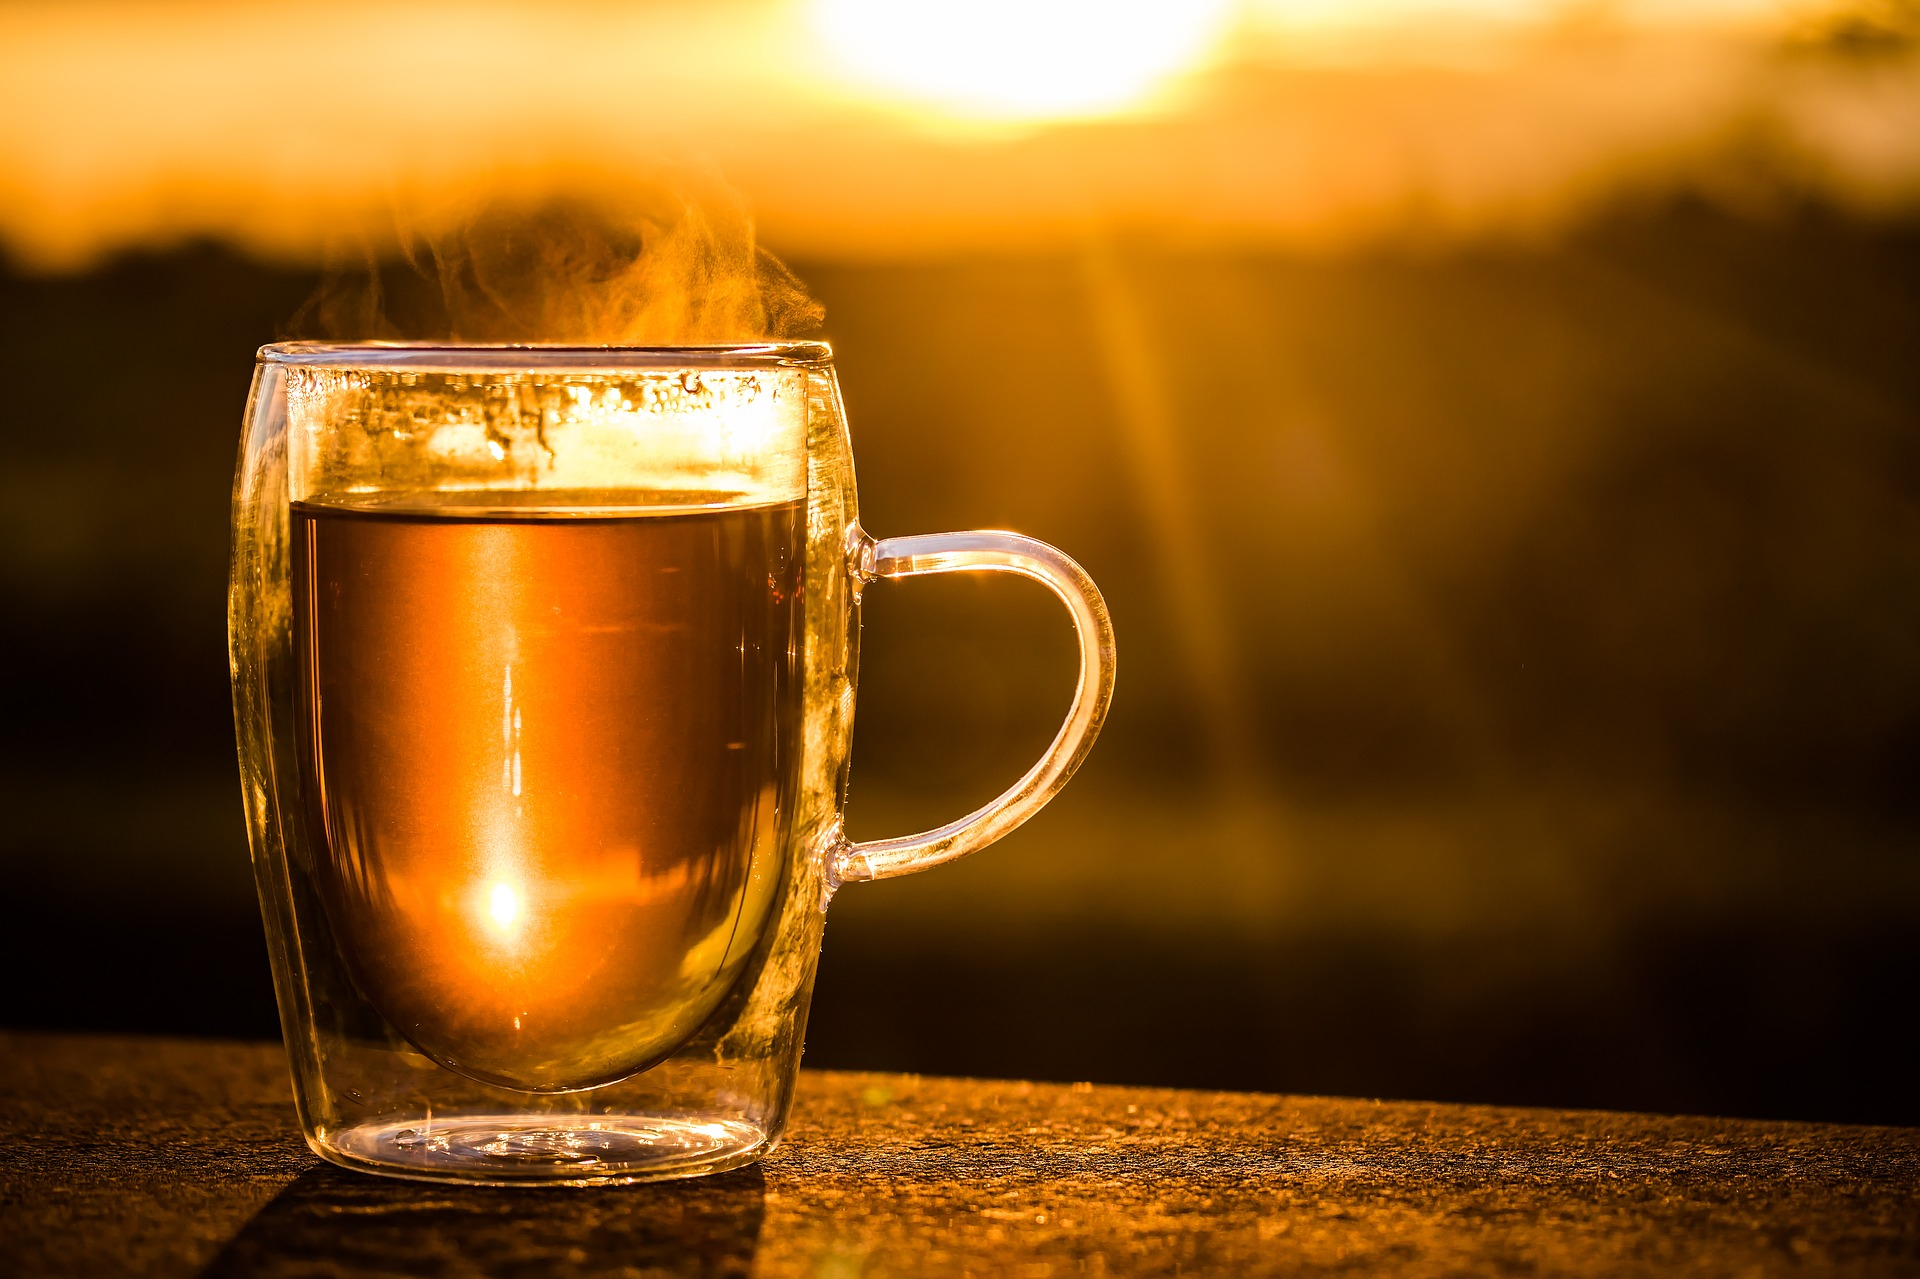 teacup-2324842_1920.jpg